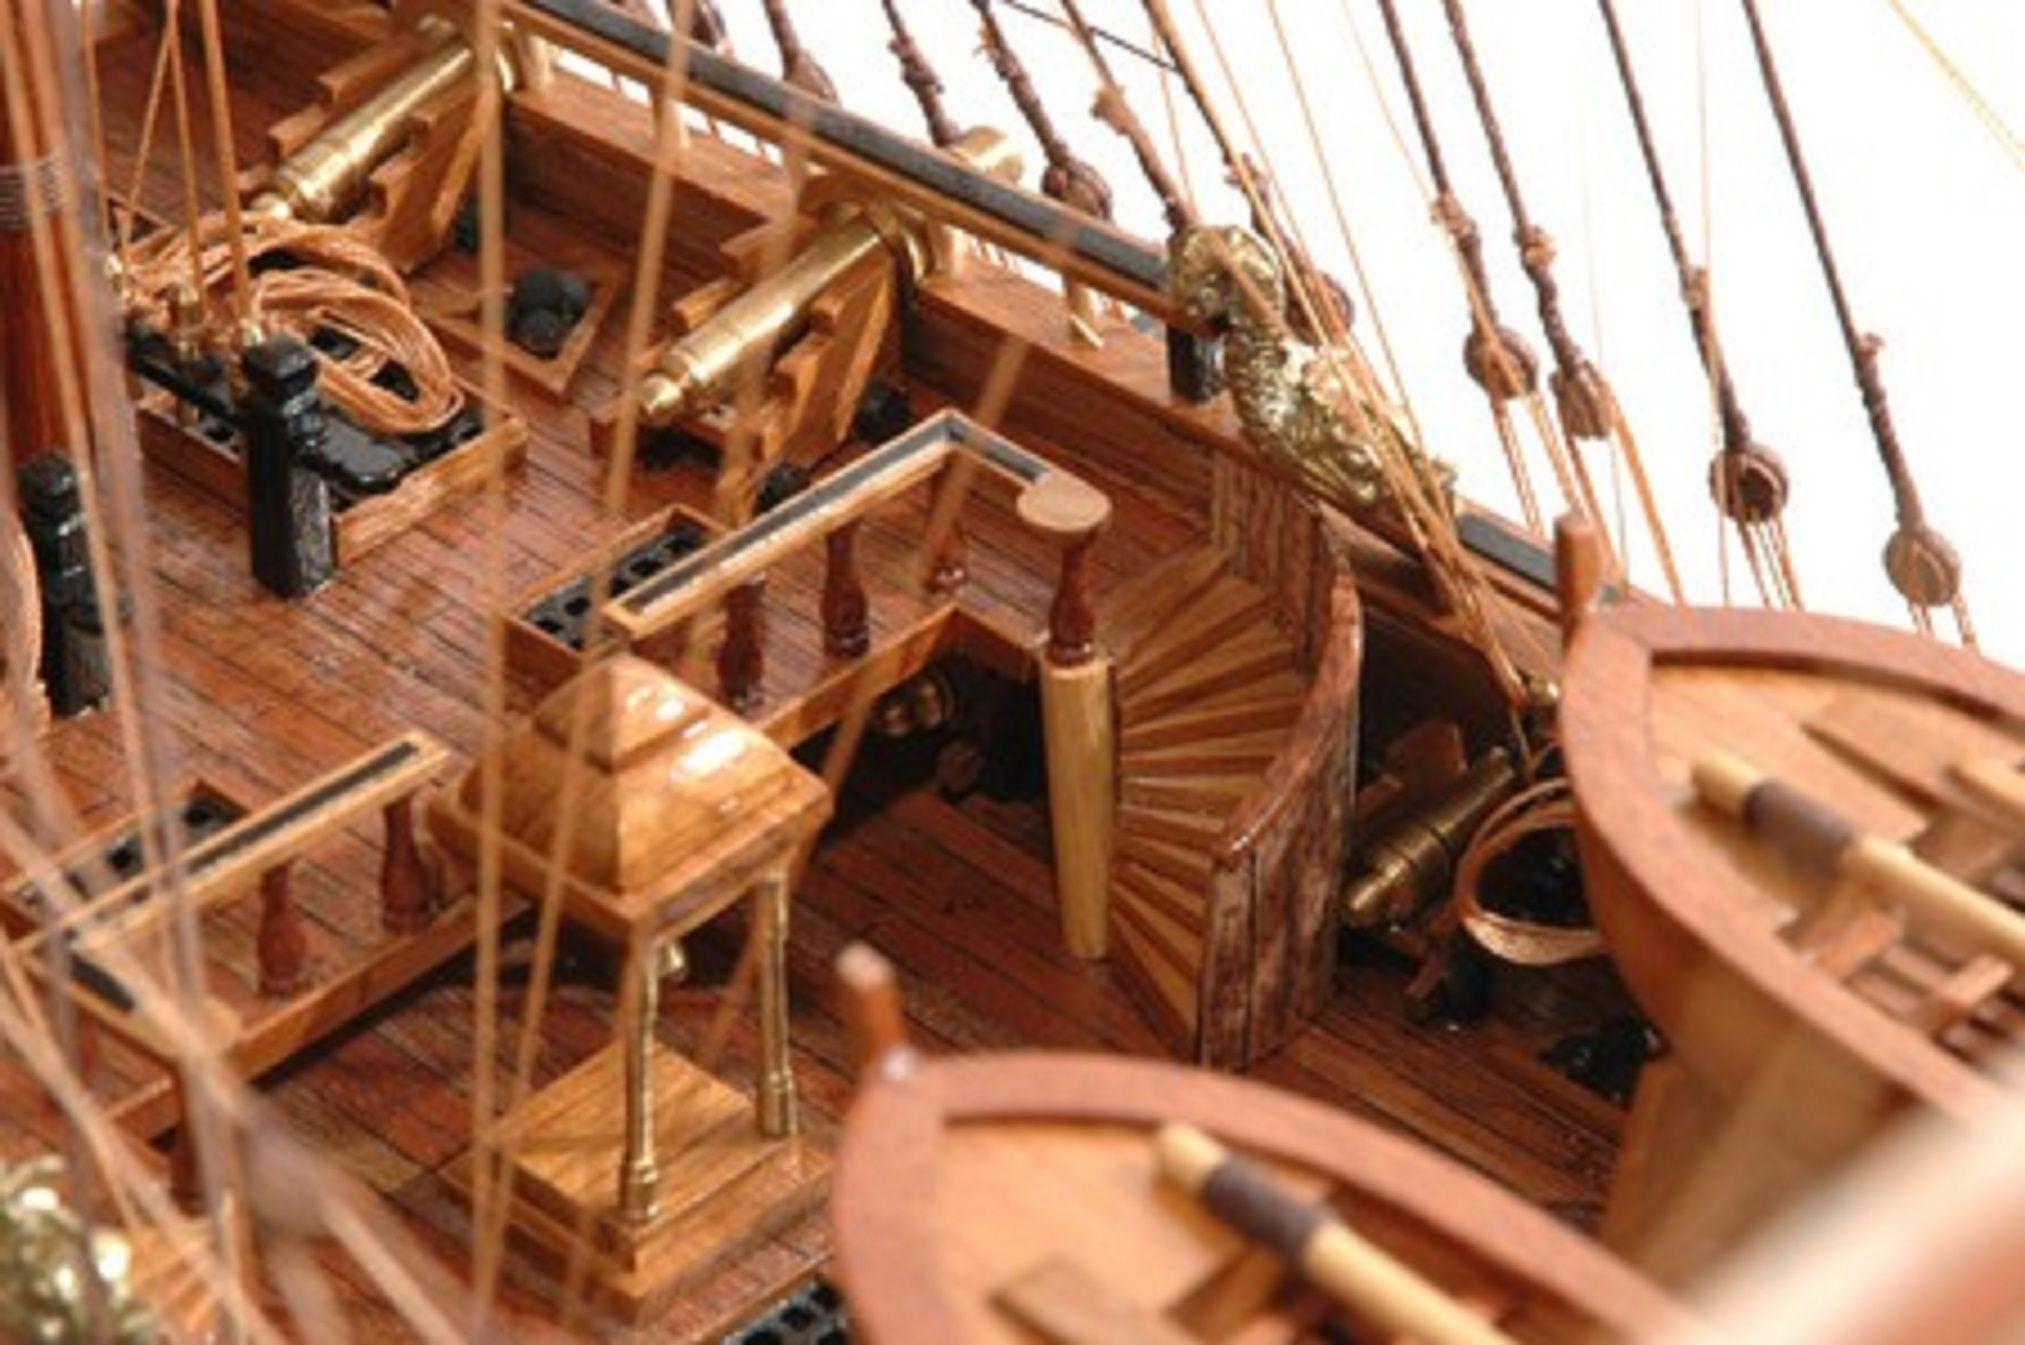 1418-7609-San-Felipe-model-ship-Extra-Large-Premier-Range